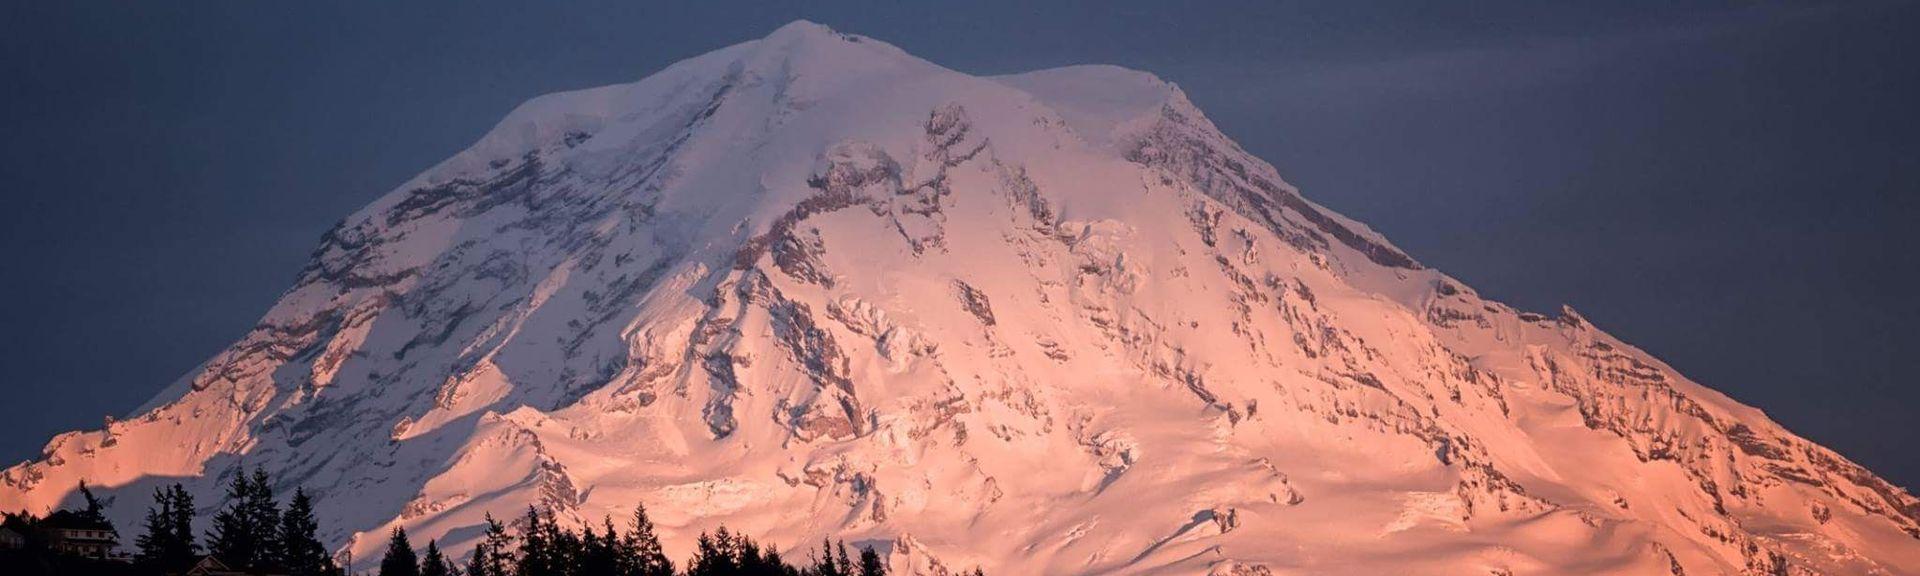 Mount Rainier National Park, WA, USA